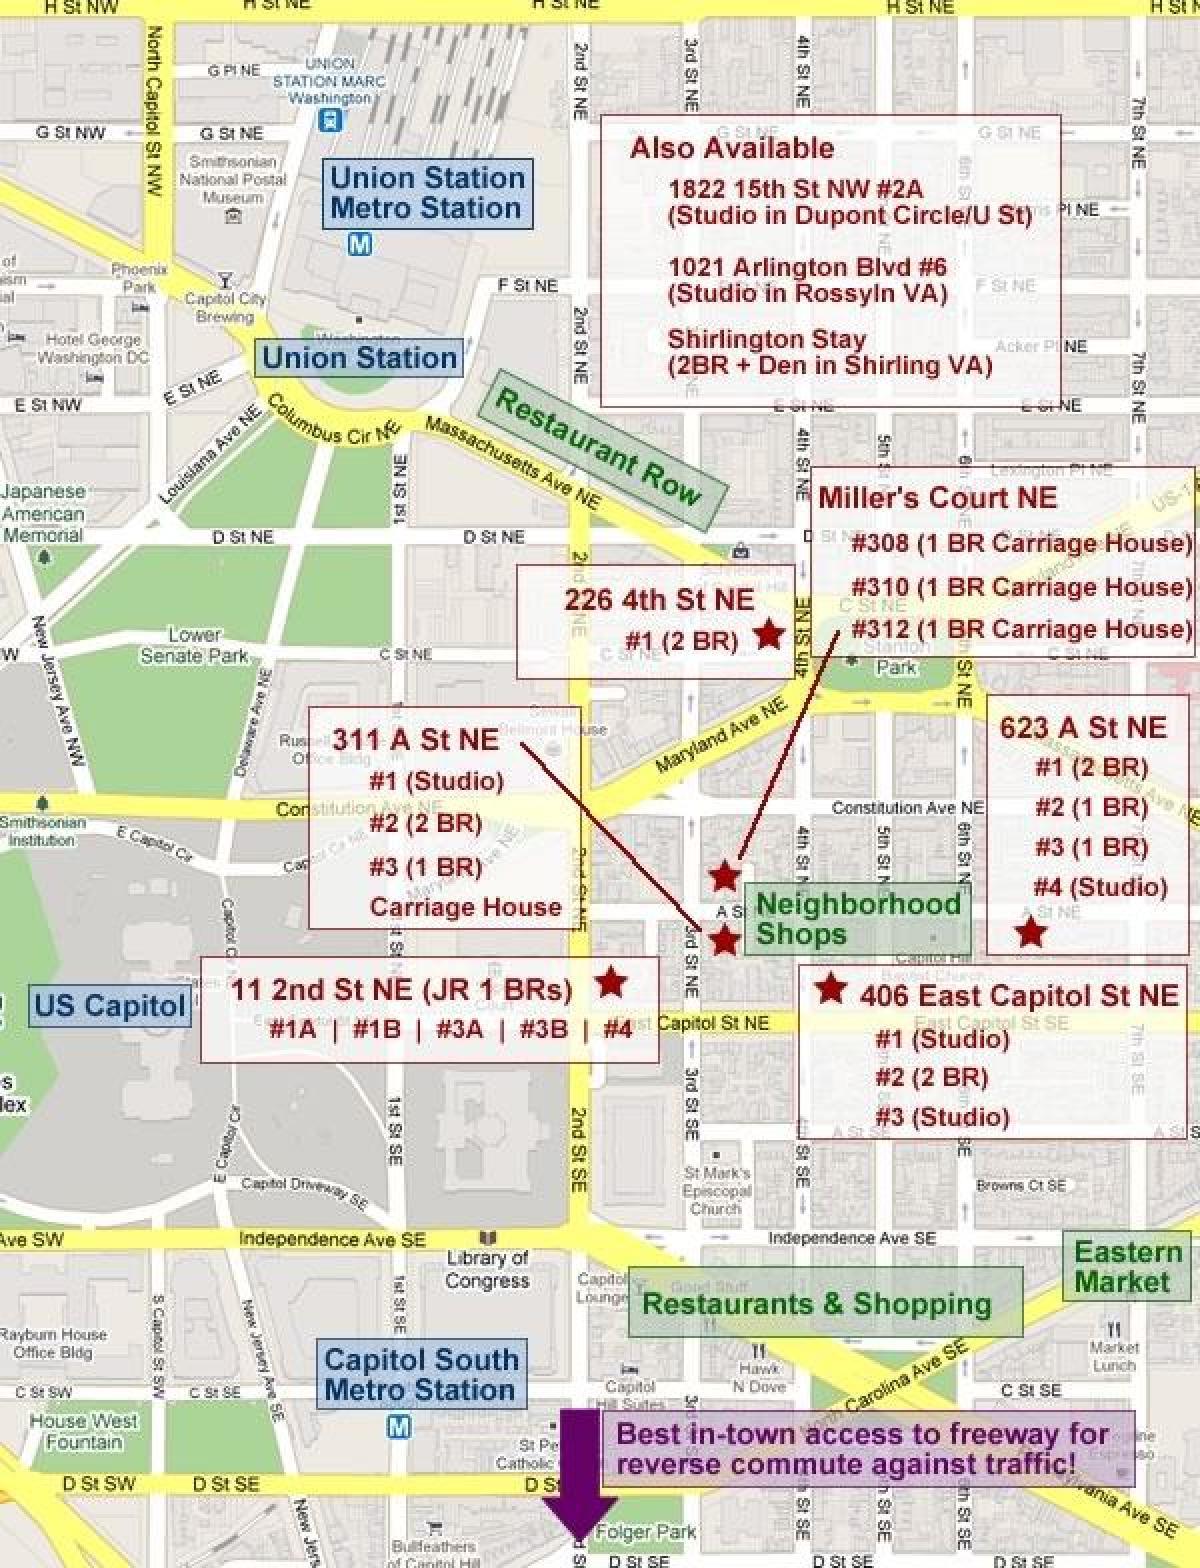 Karte von capitol hill dc - Karte des capitol hill in washington dc on